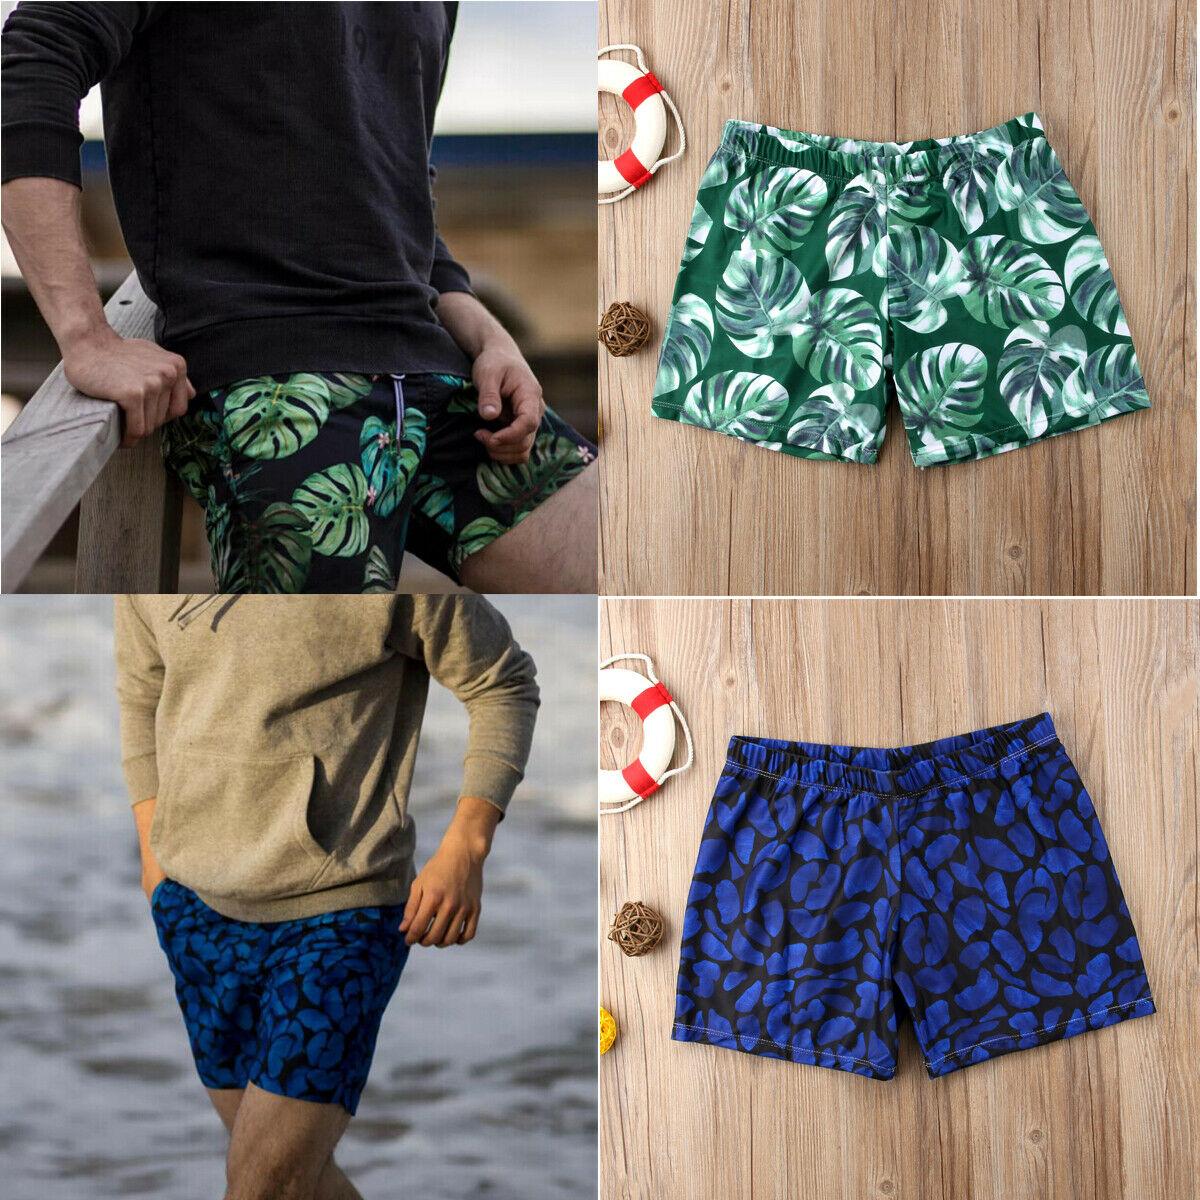 Fashion Summer Men Boy  Casual Print Swimming Board Trunks Swim Surfer Shorts Swimwear Beachwear